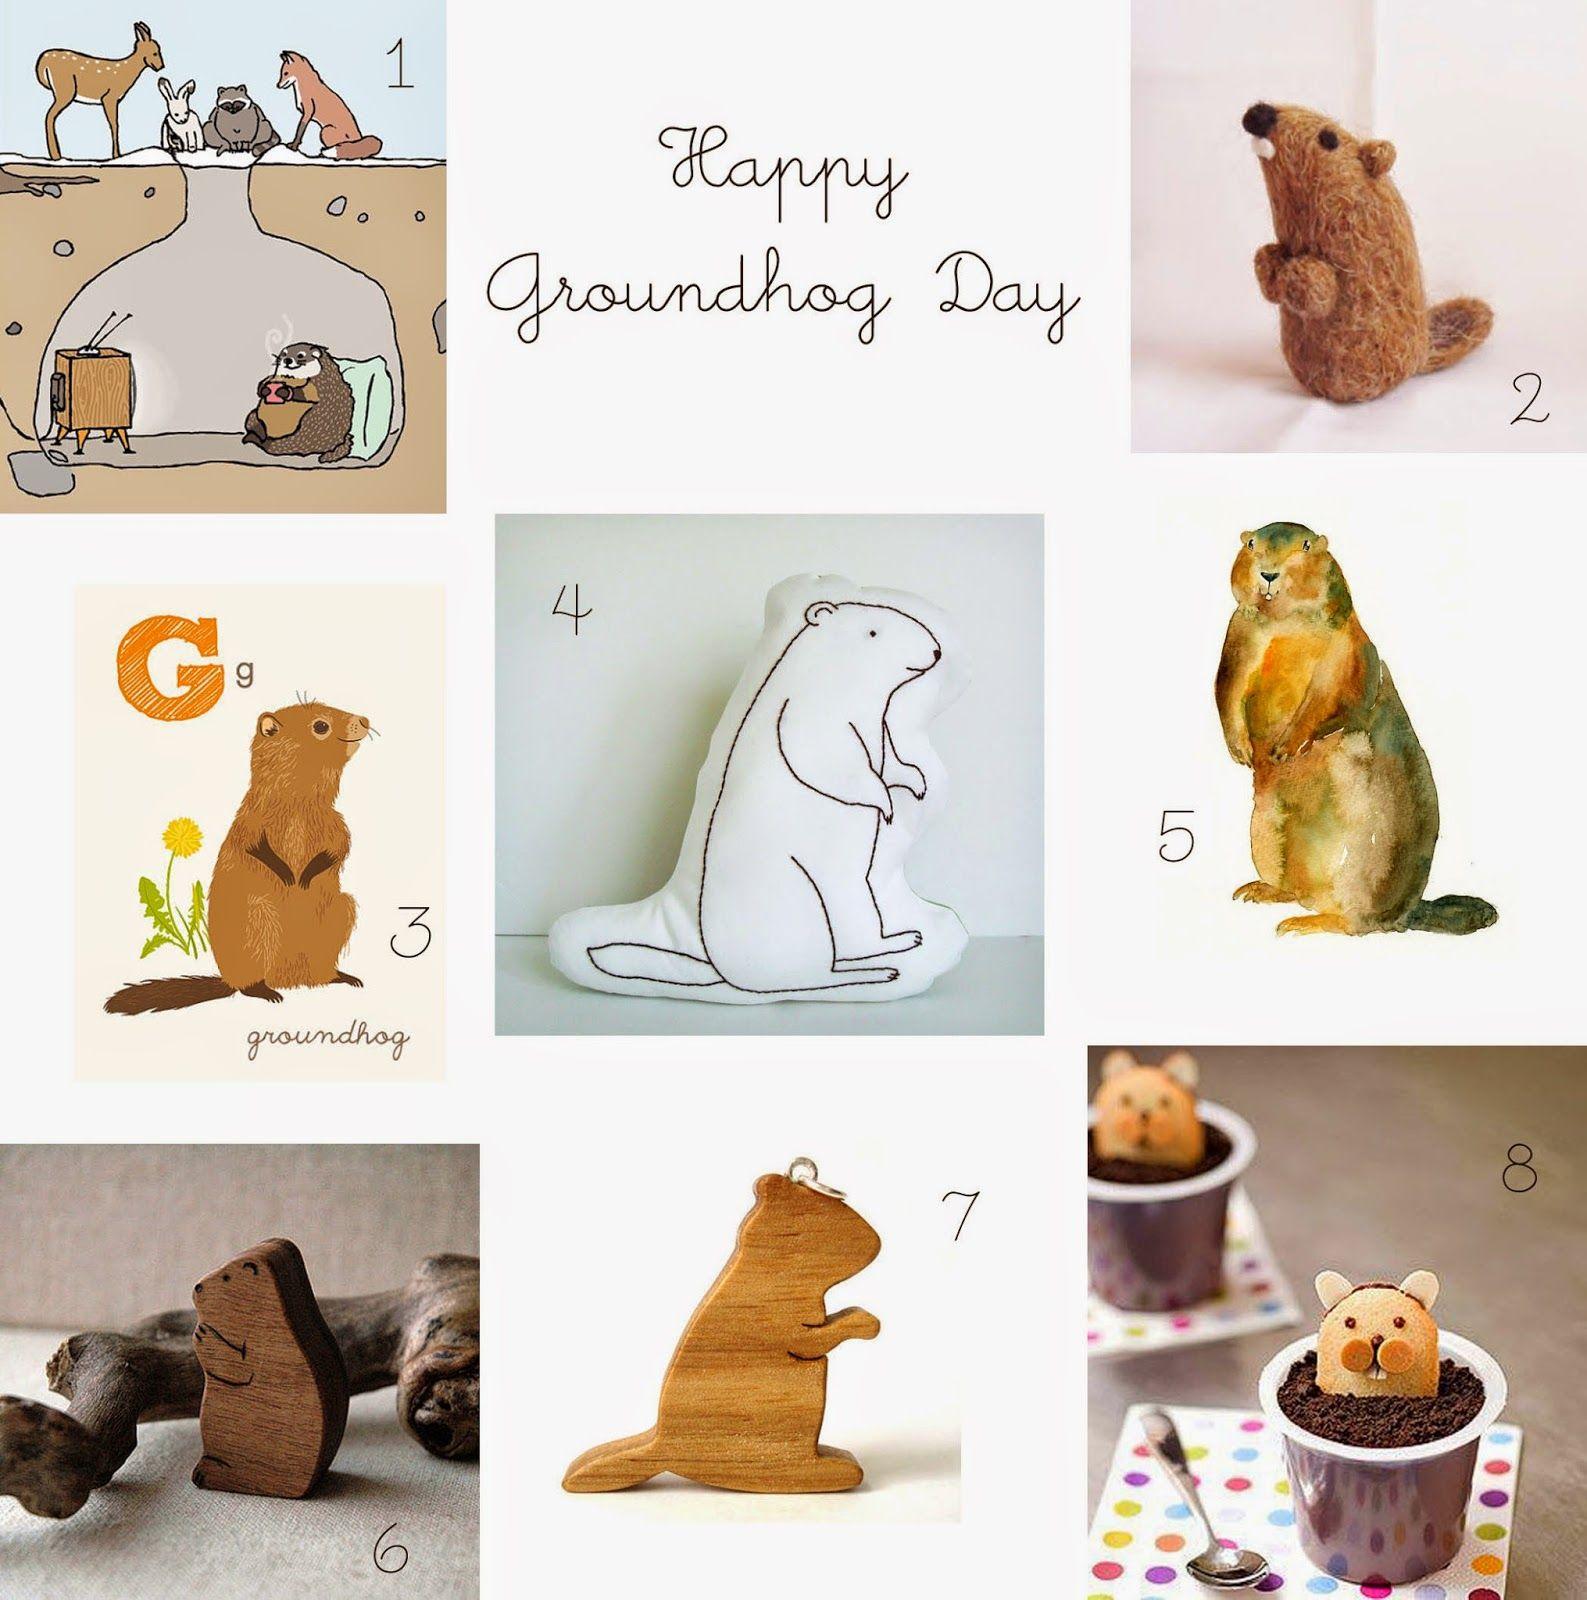 A Little World: 1. Doodle and Hoob 2. Felt in Devon 3. Groundhog DaySea ...